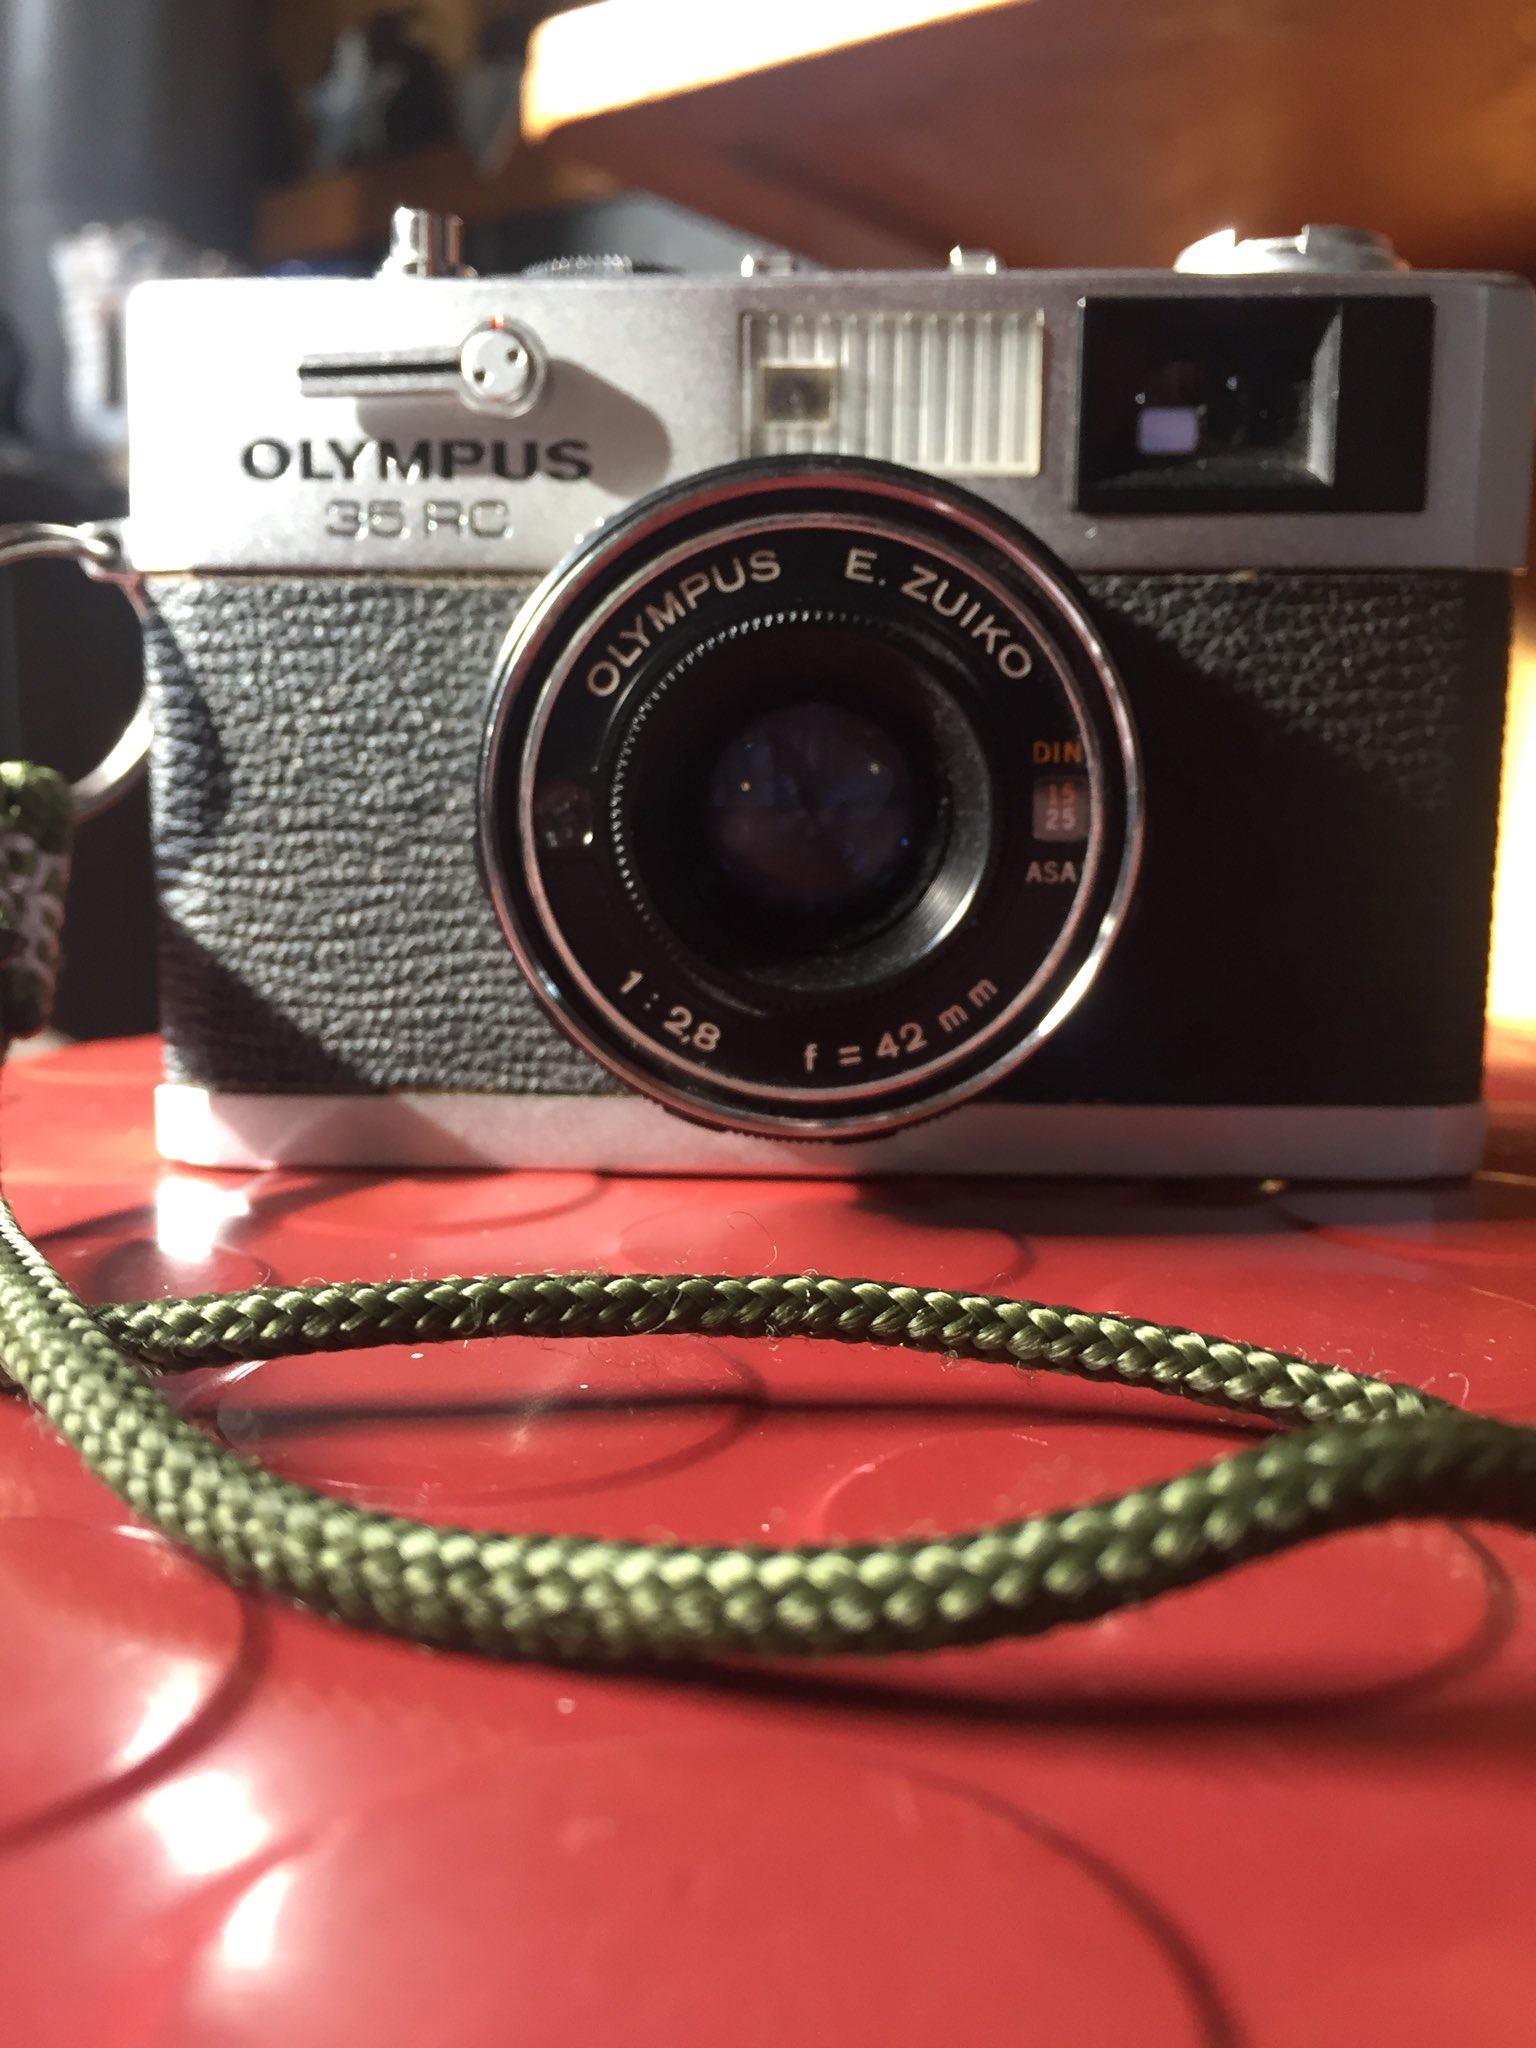 The Olympus 35RC rangefinder camera.